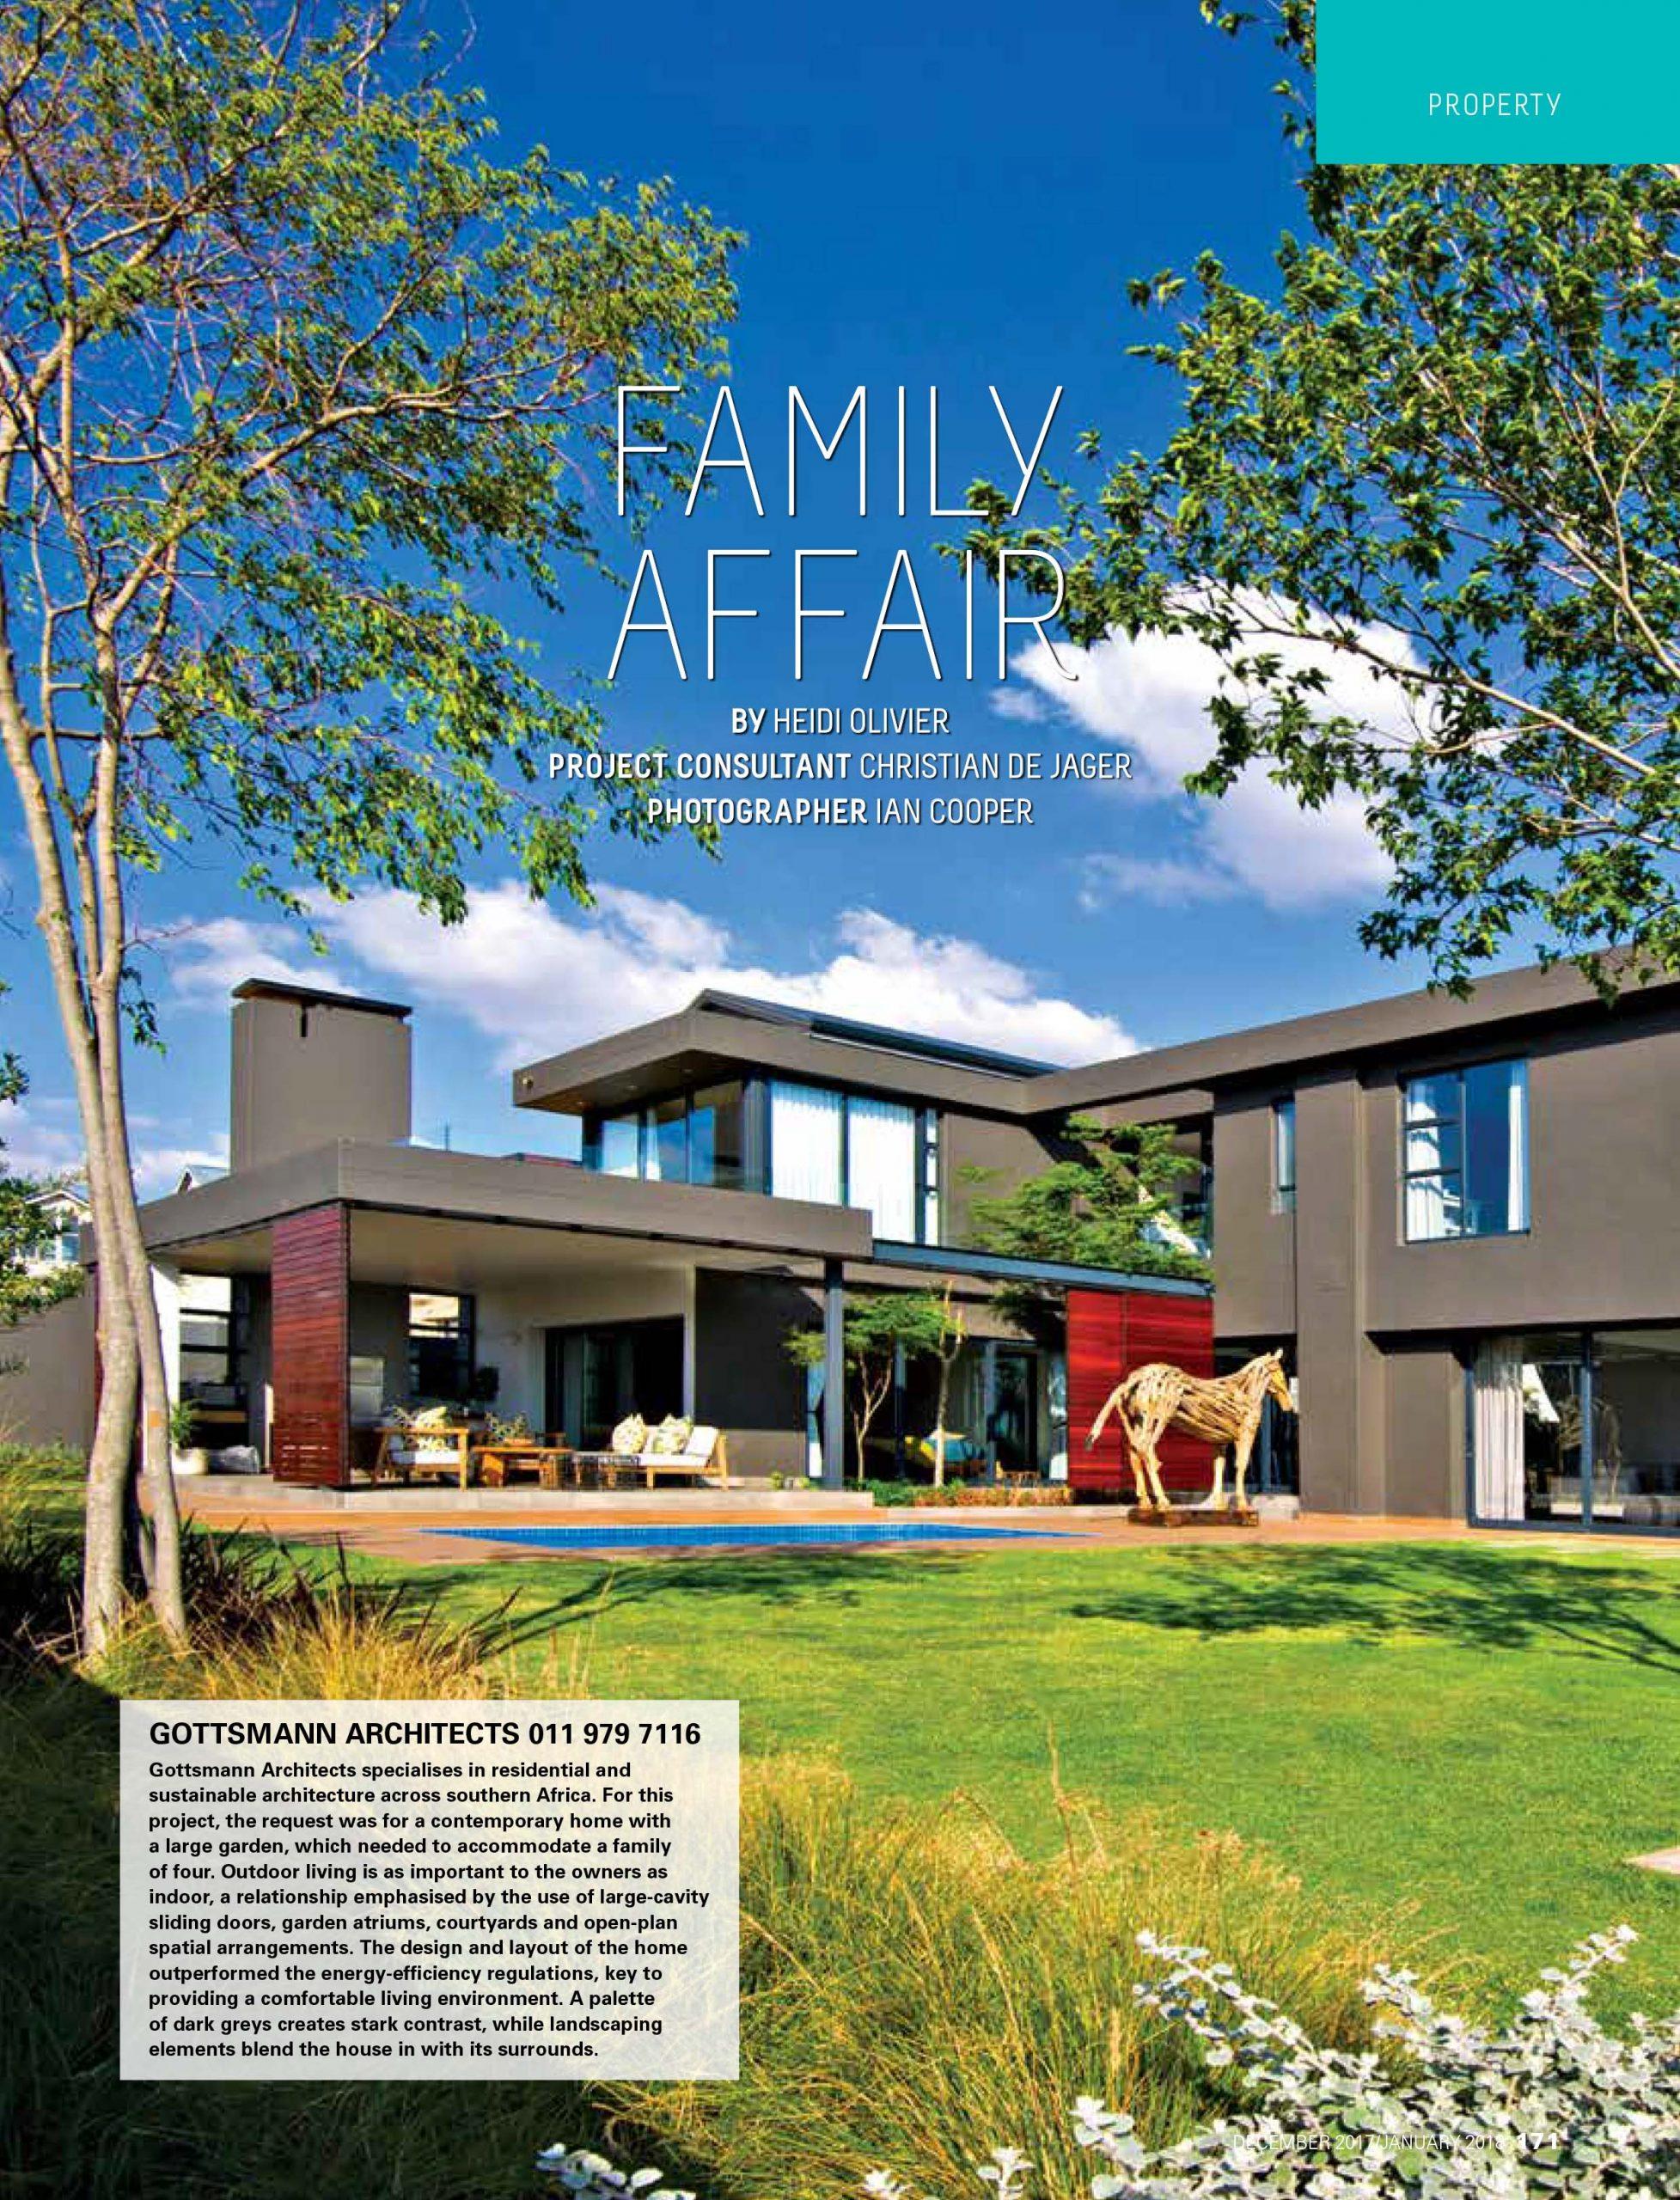 Family Affair Dec - Jan pages 171 cover